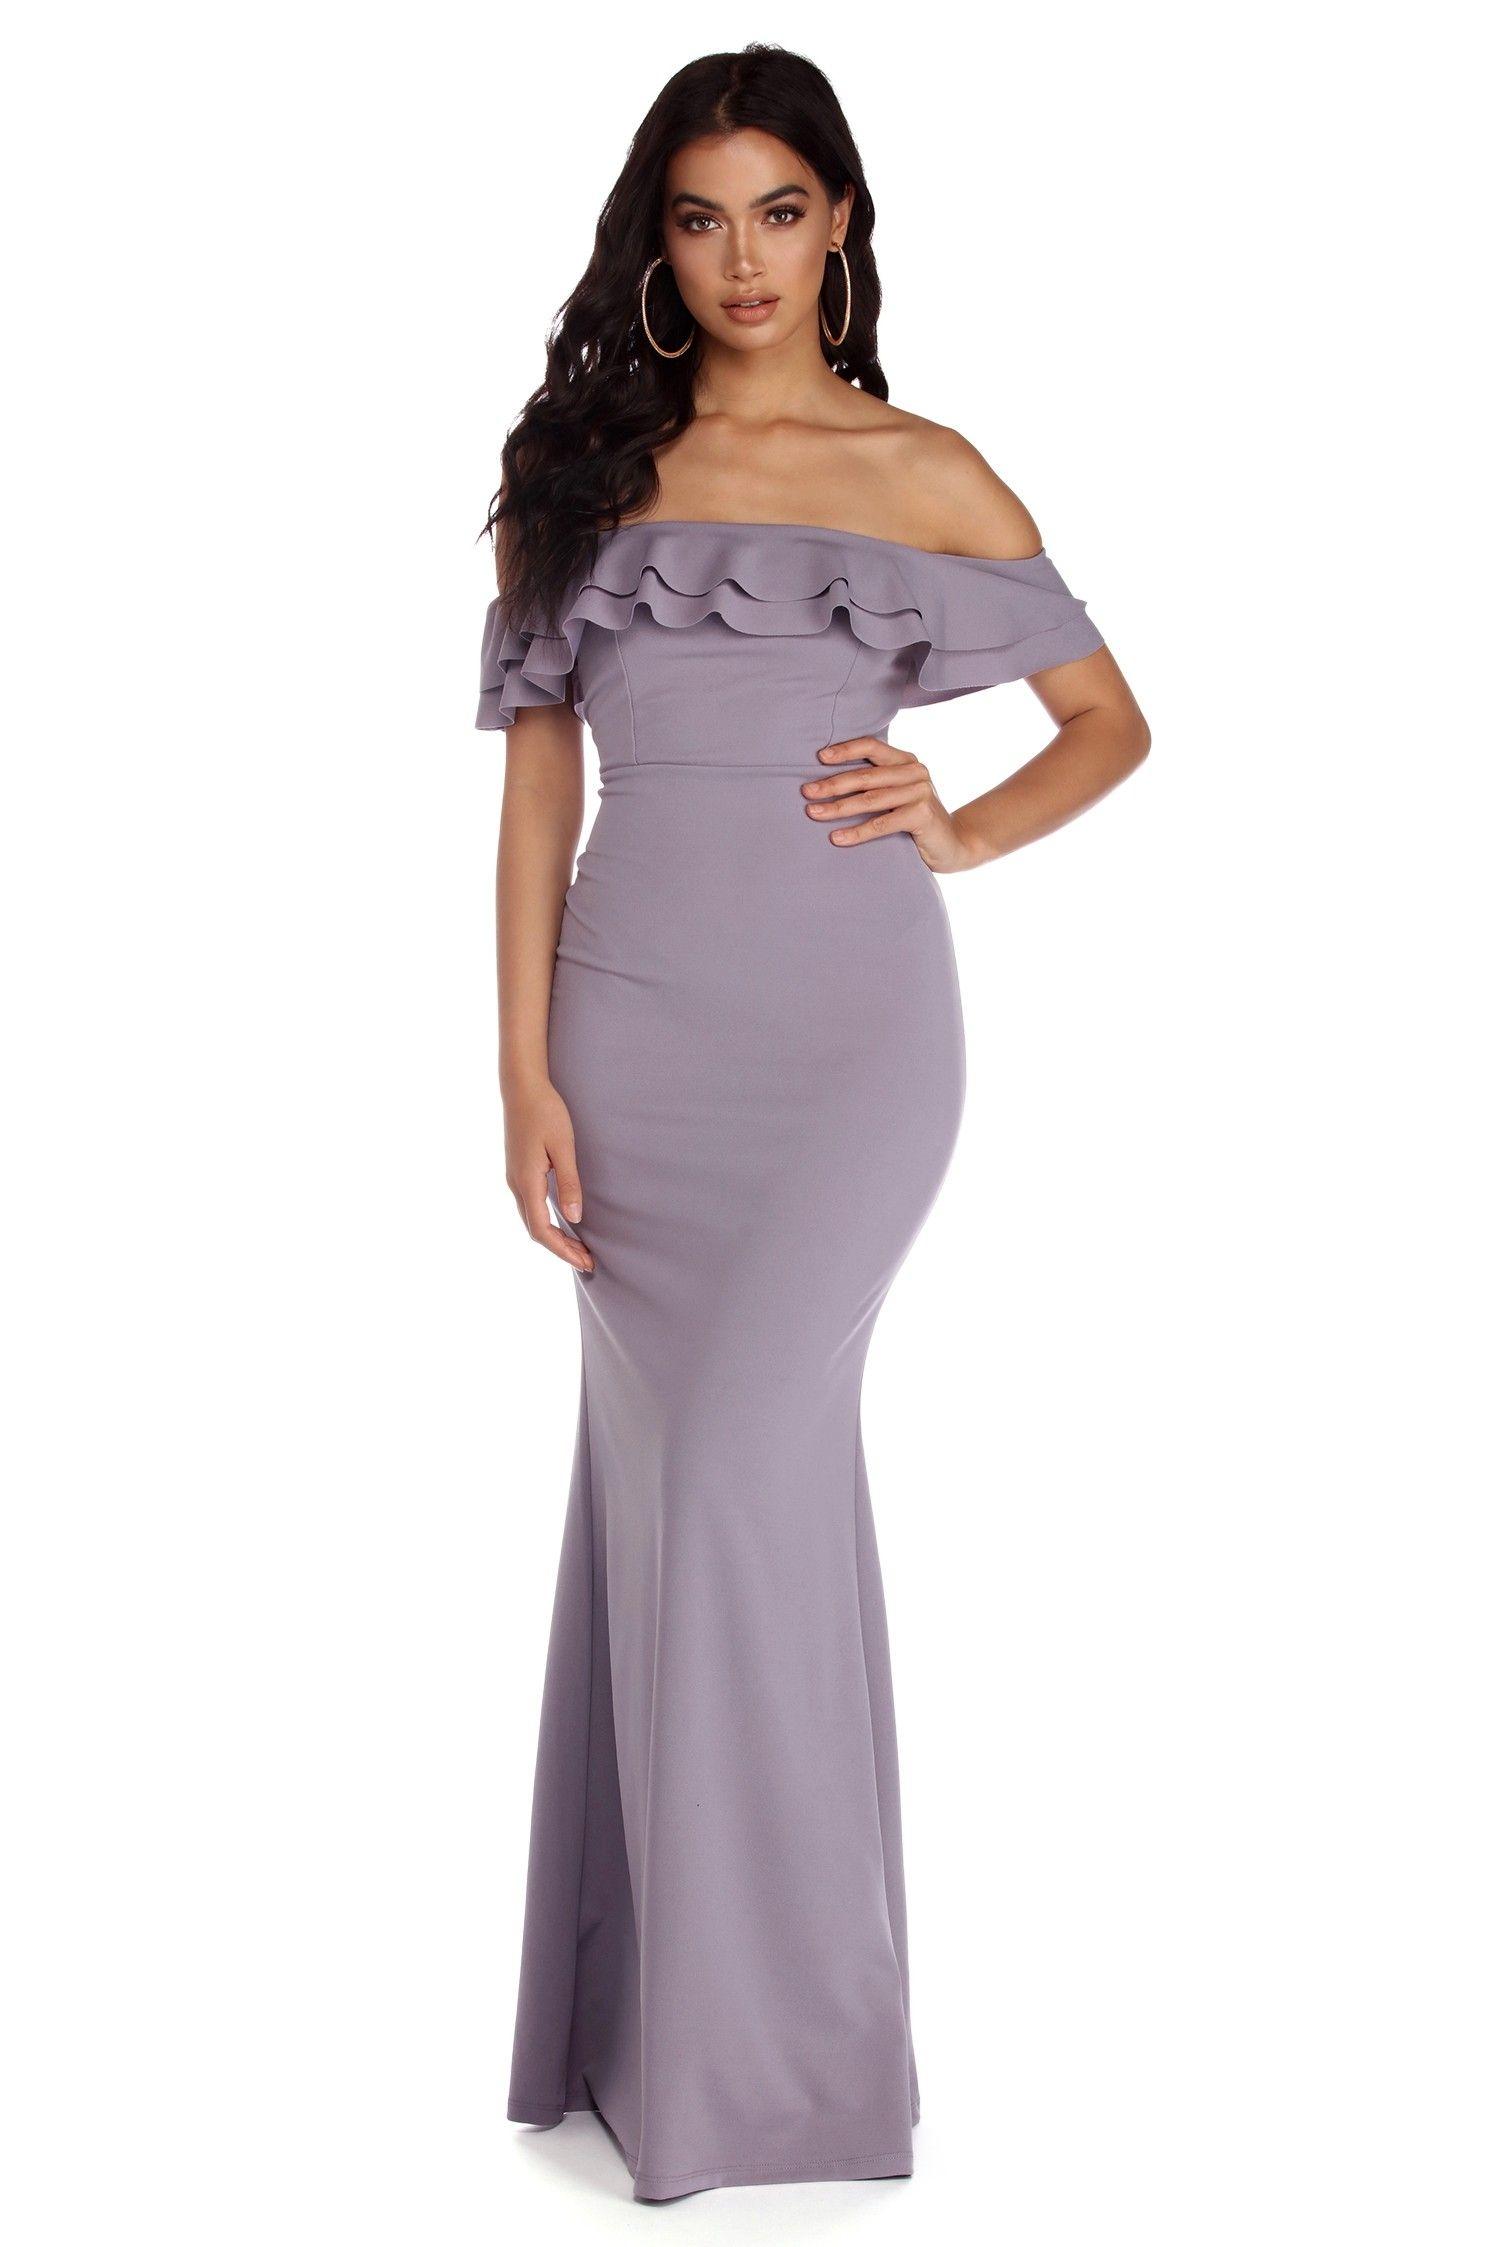 Roxanne double ruffle formal dress prom dresses pinterest